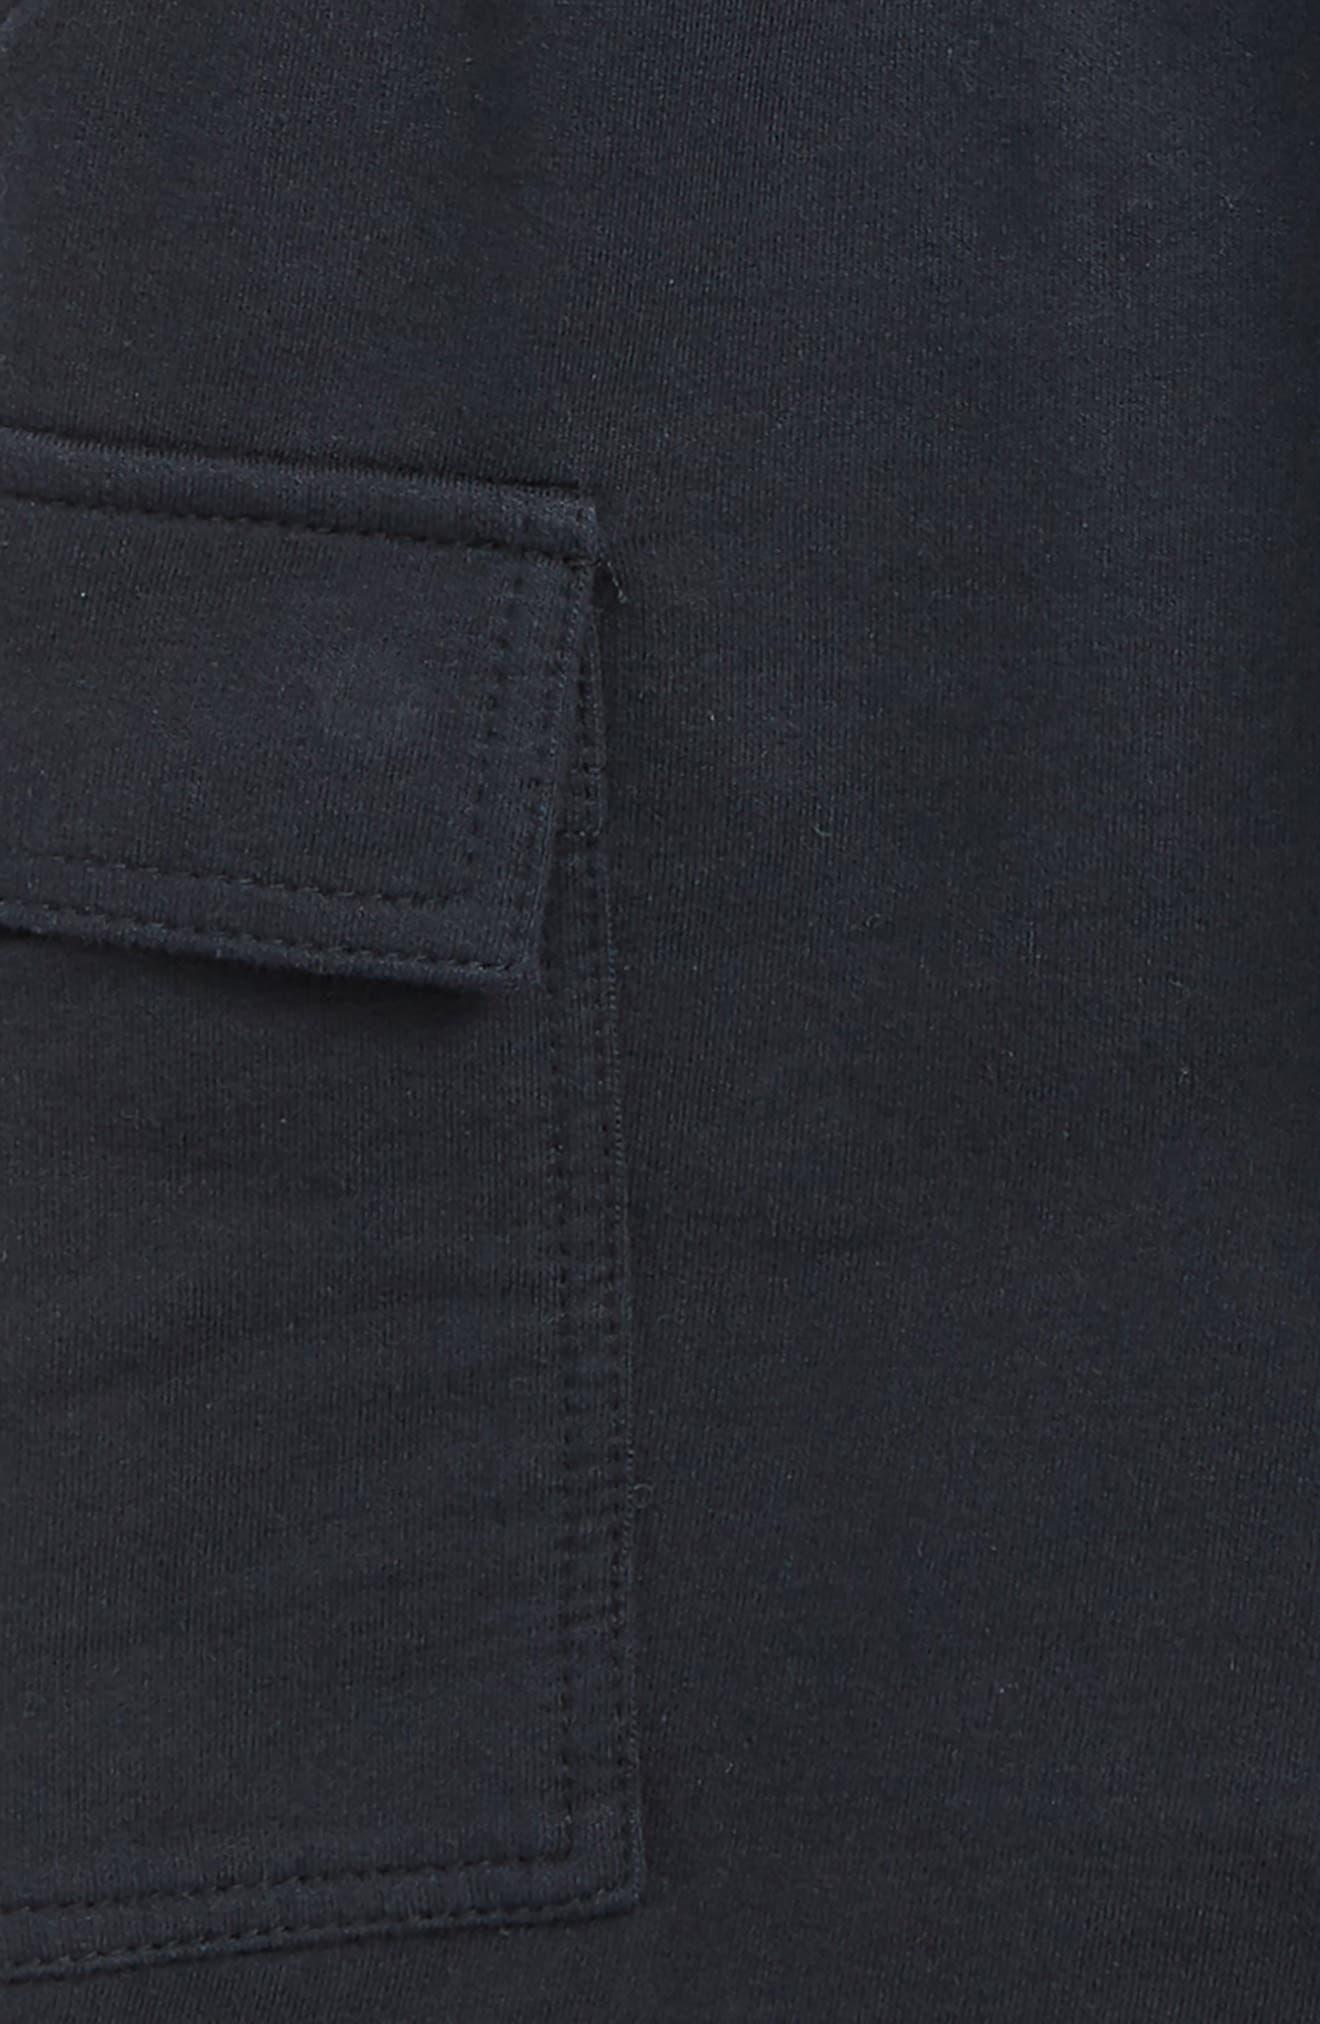 Cargo Shorts,                             Alternate thumbnail 2, color,                             True Navy